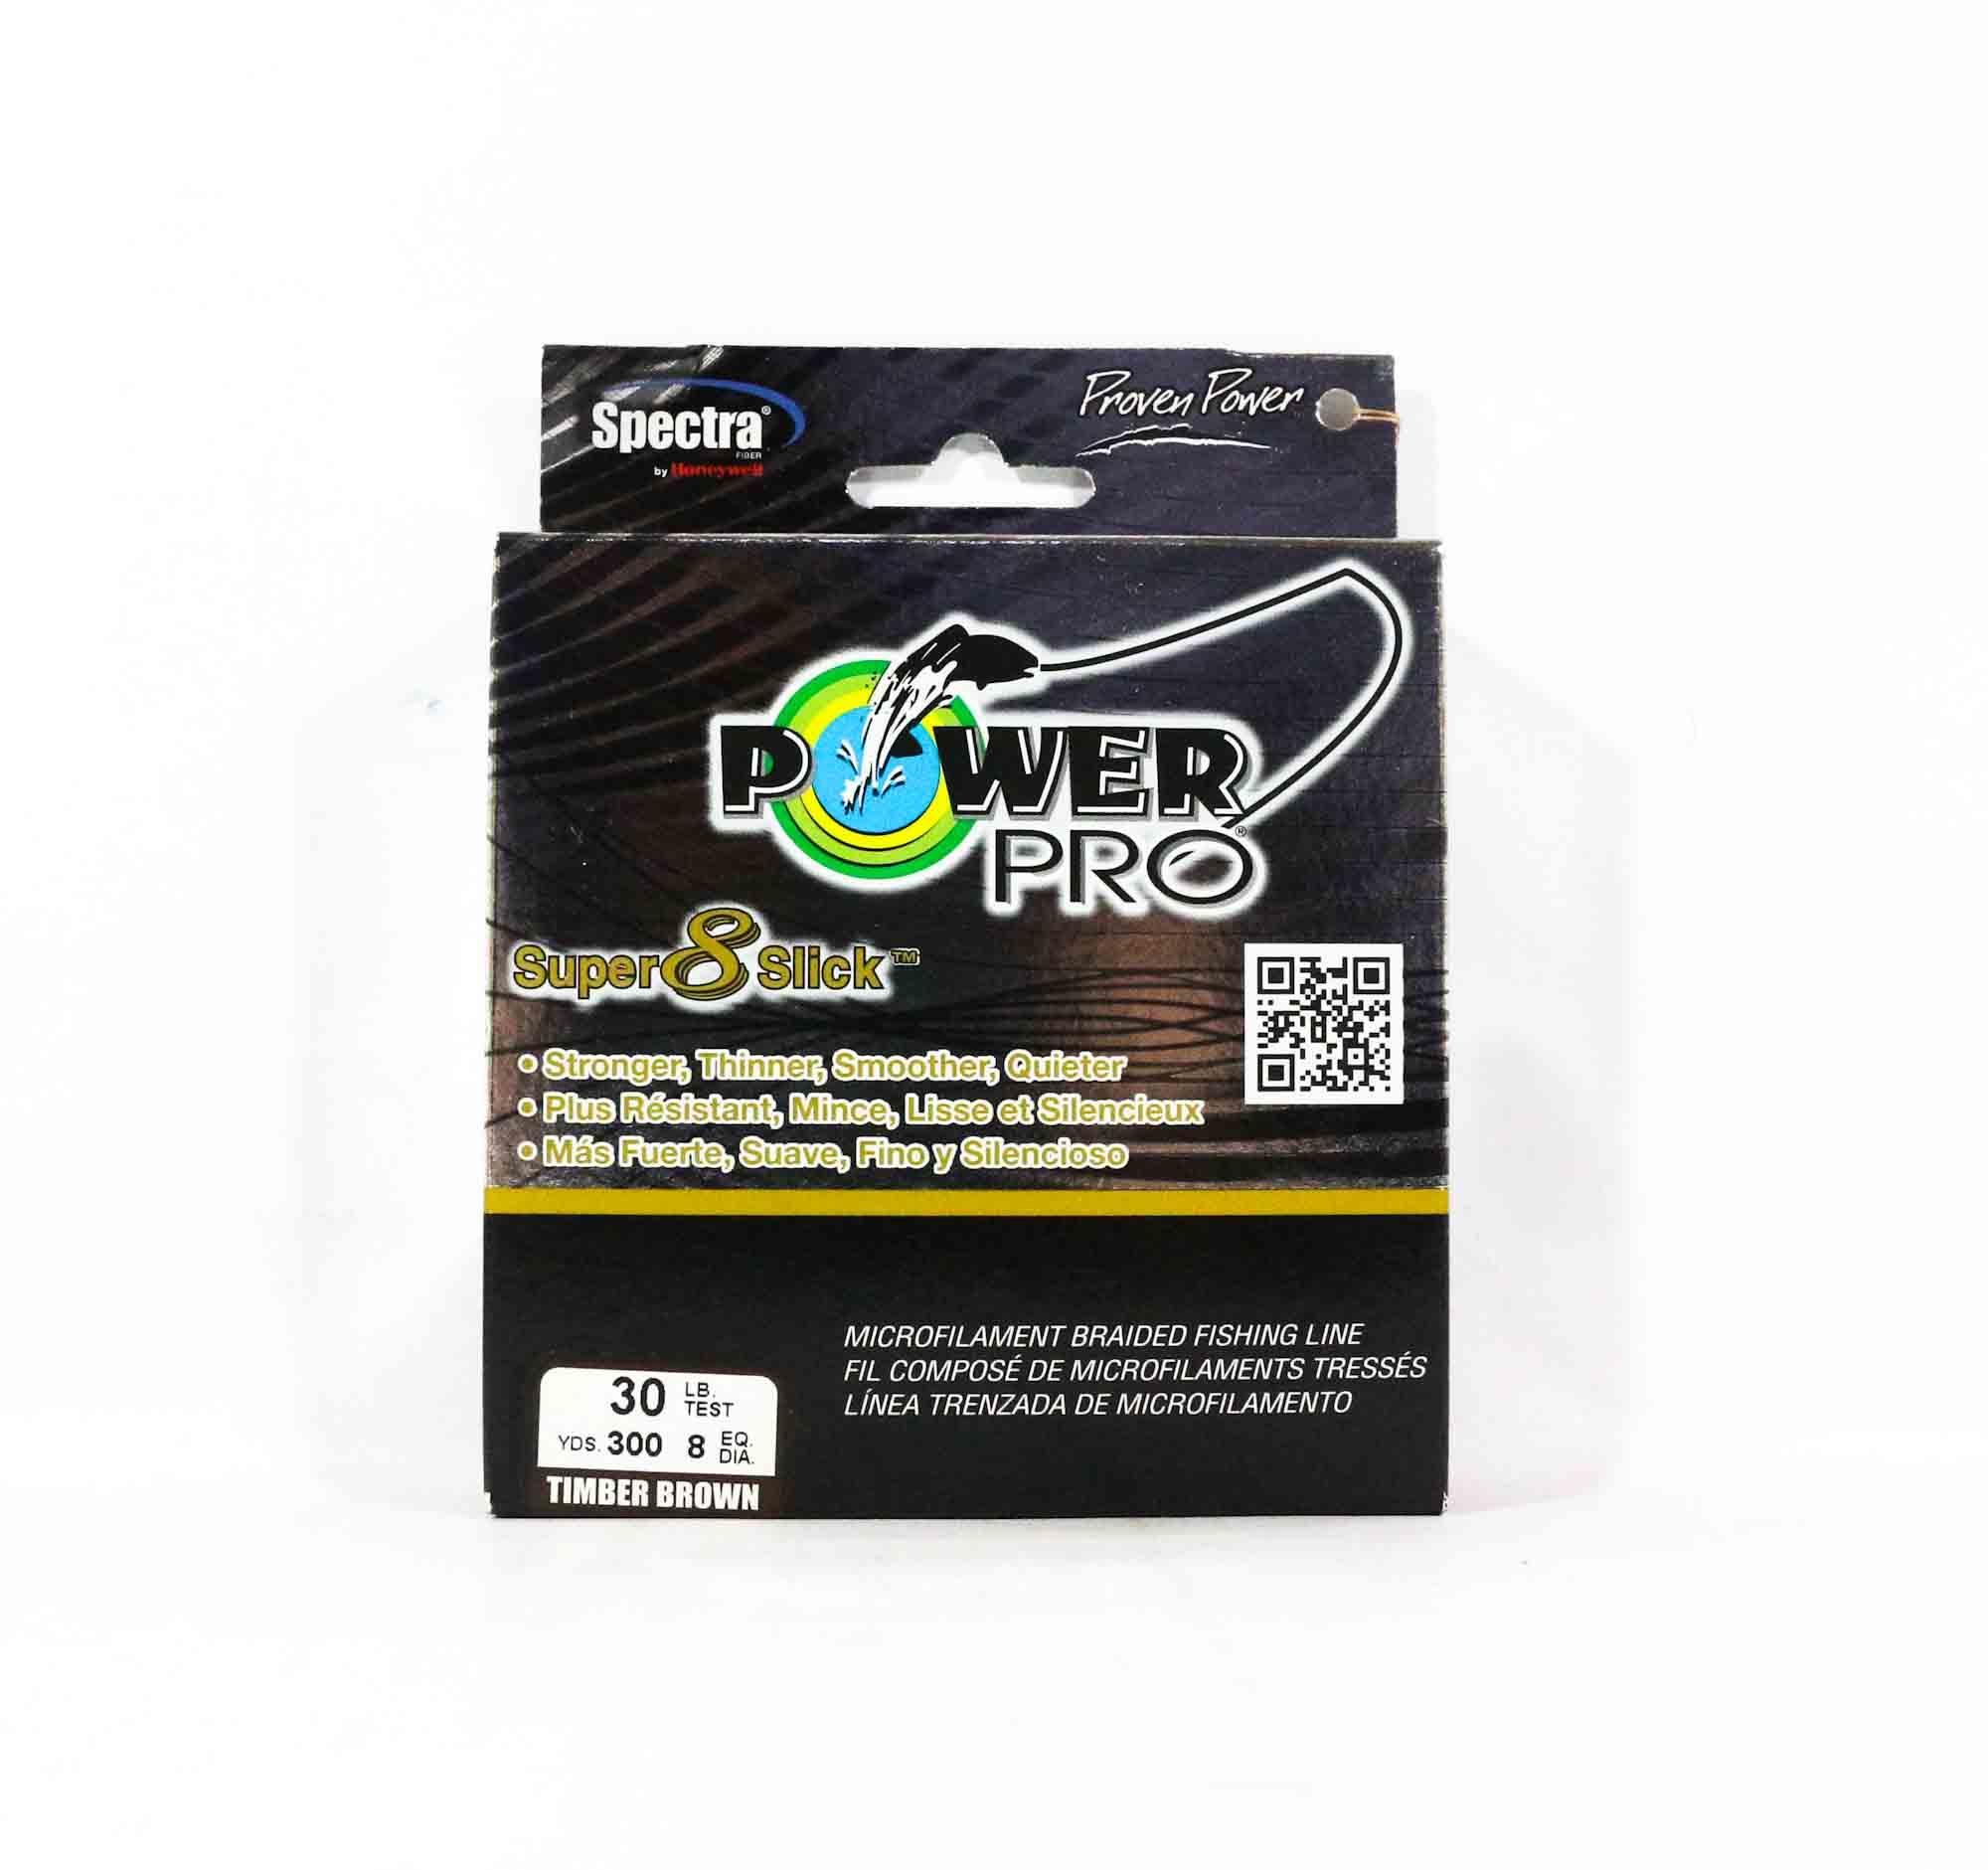 Power Pro Super 8 Slick Spectra Line 30lb by 300yds Brown (0480)